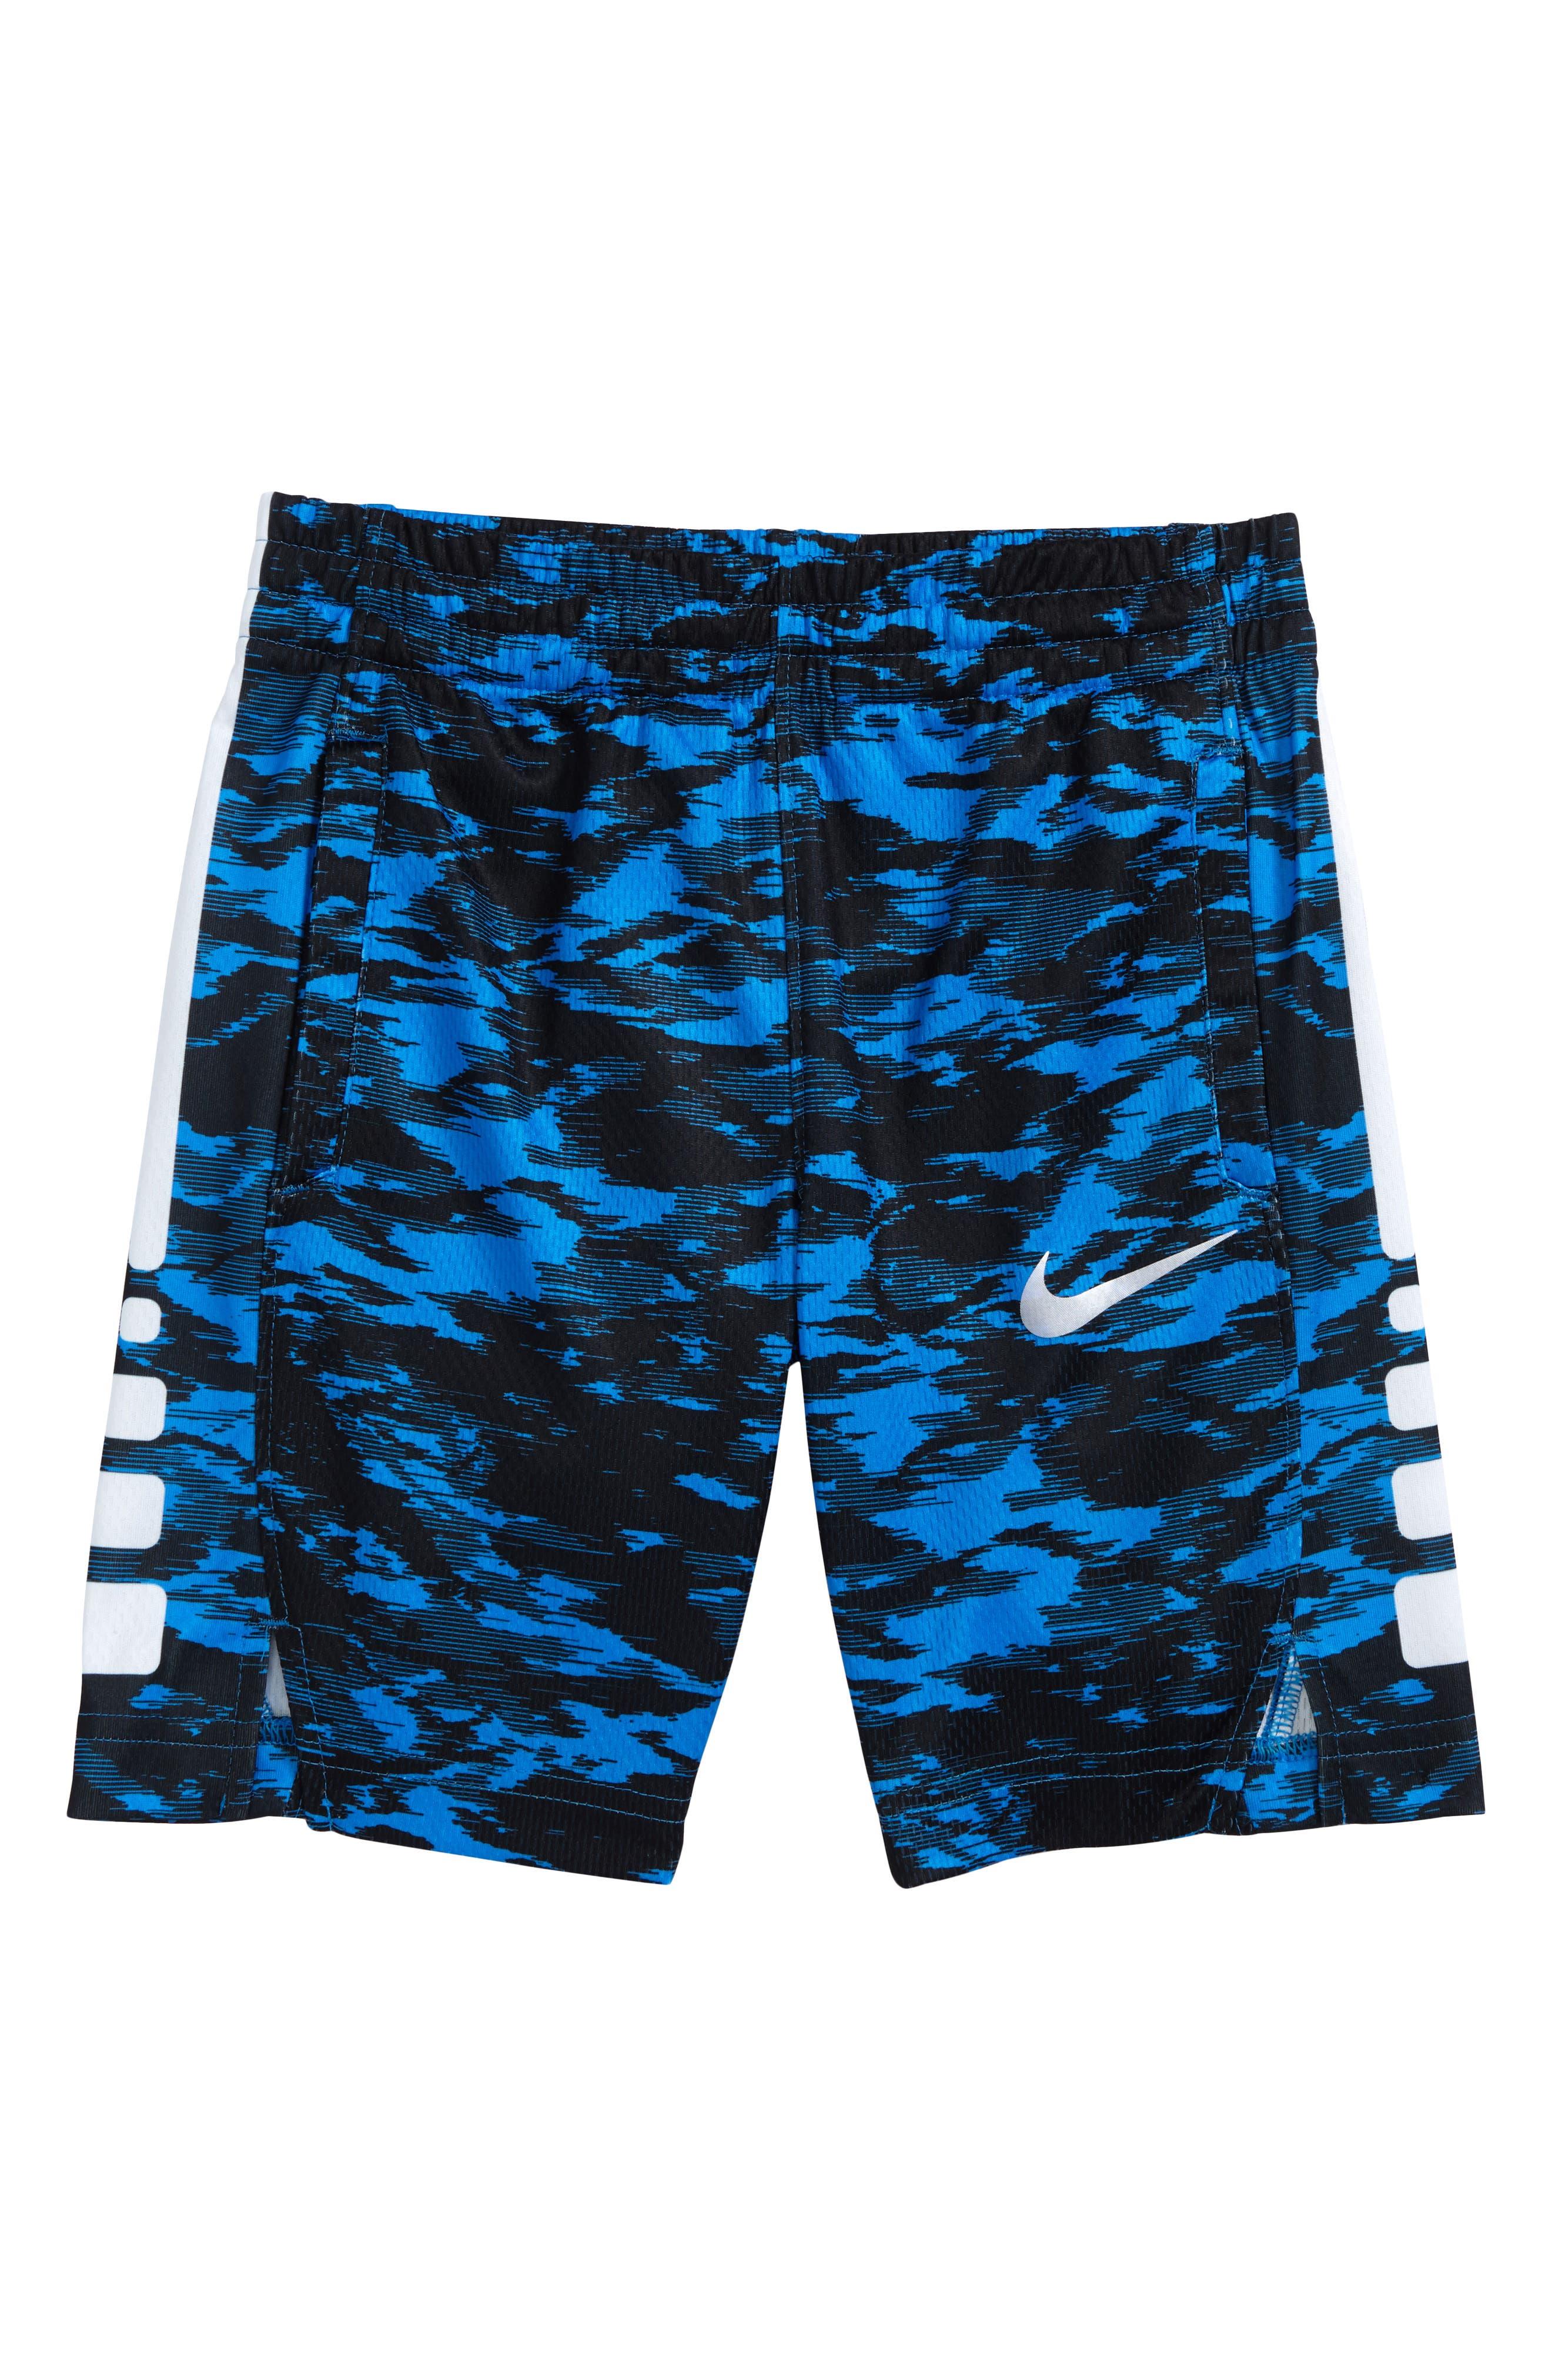 Vent AOP Shorts,                         Main,                         color, 453